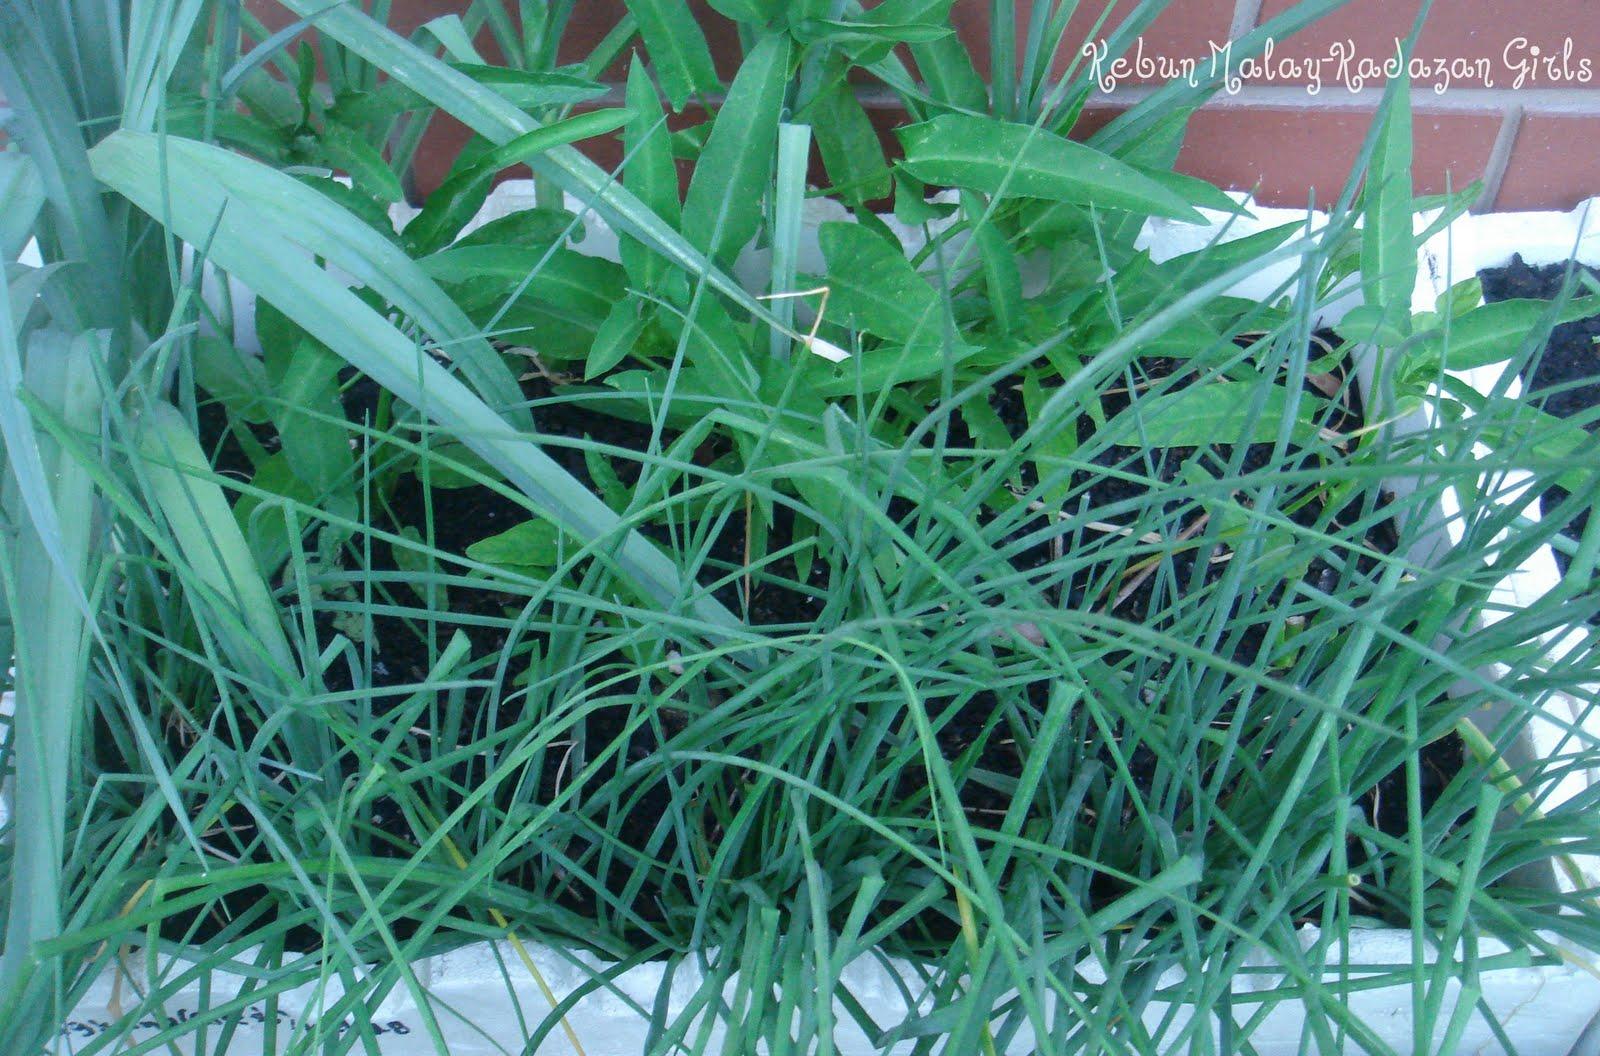 Kebun Malay-Kadazan girls: Leek Lucky Mate Leek Companion Plants